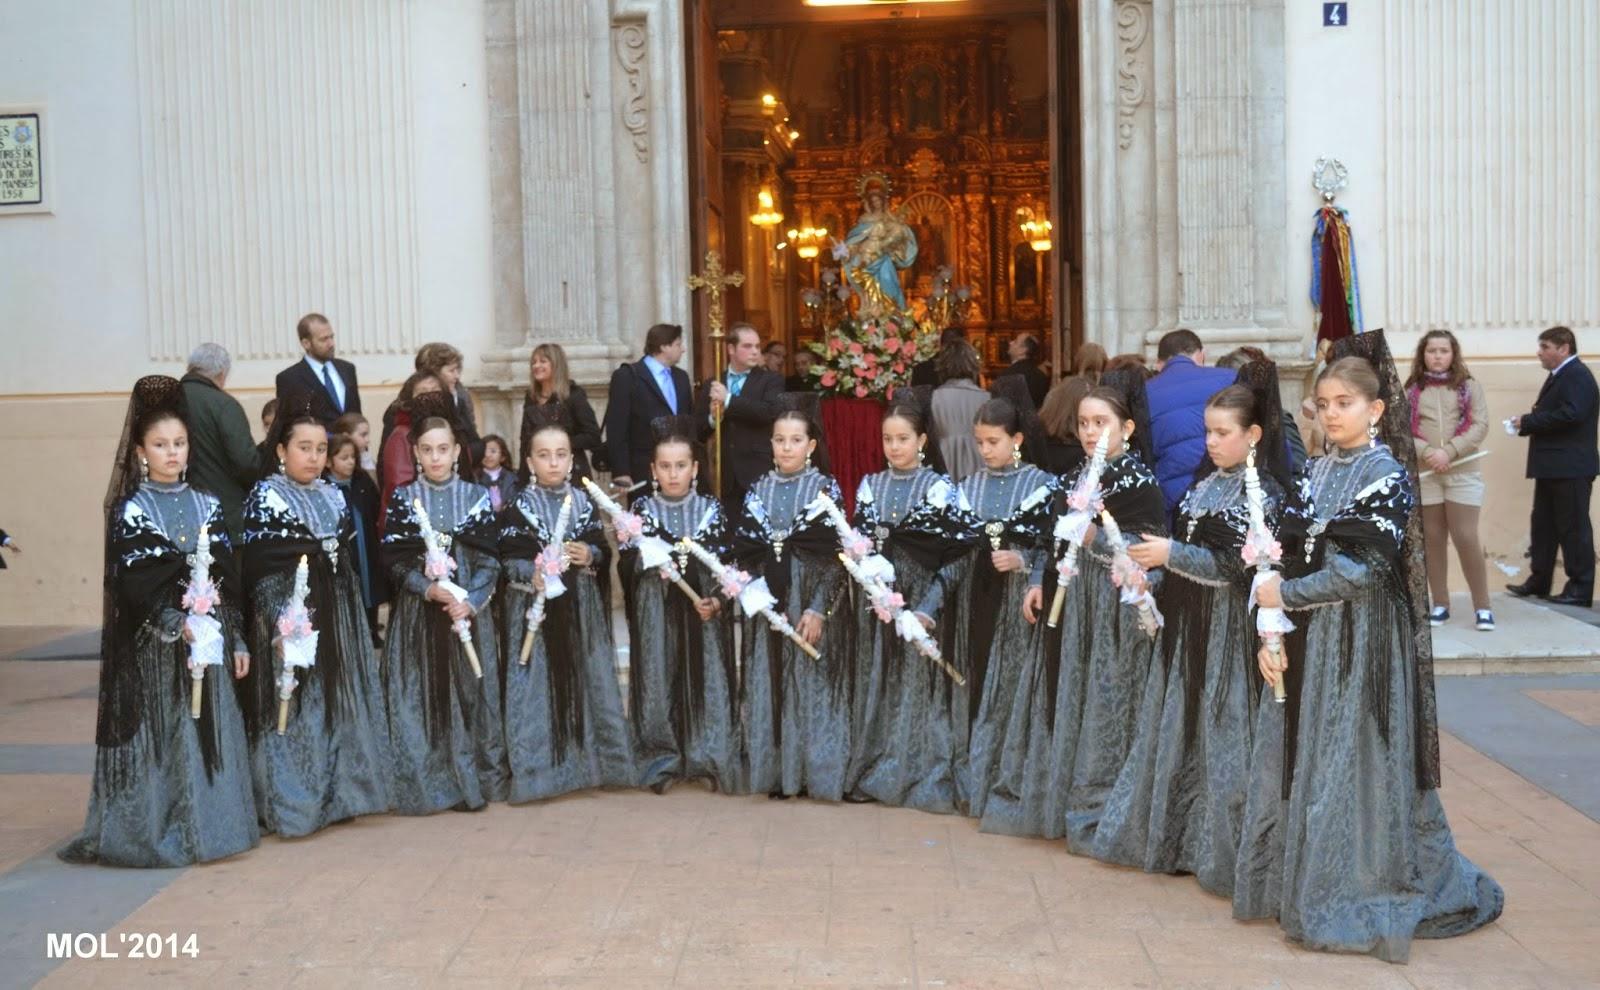 LA CANDELARIA DE 2014 EN LA PARROQUIA DE SANT JOAN BATISTE DE MANISES